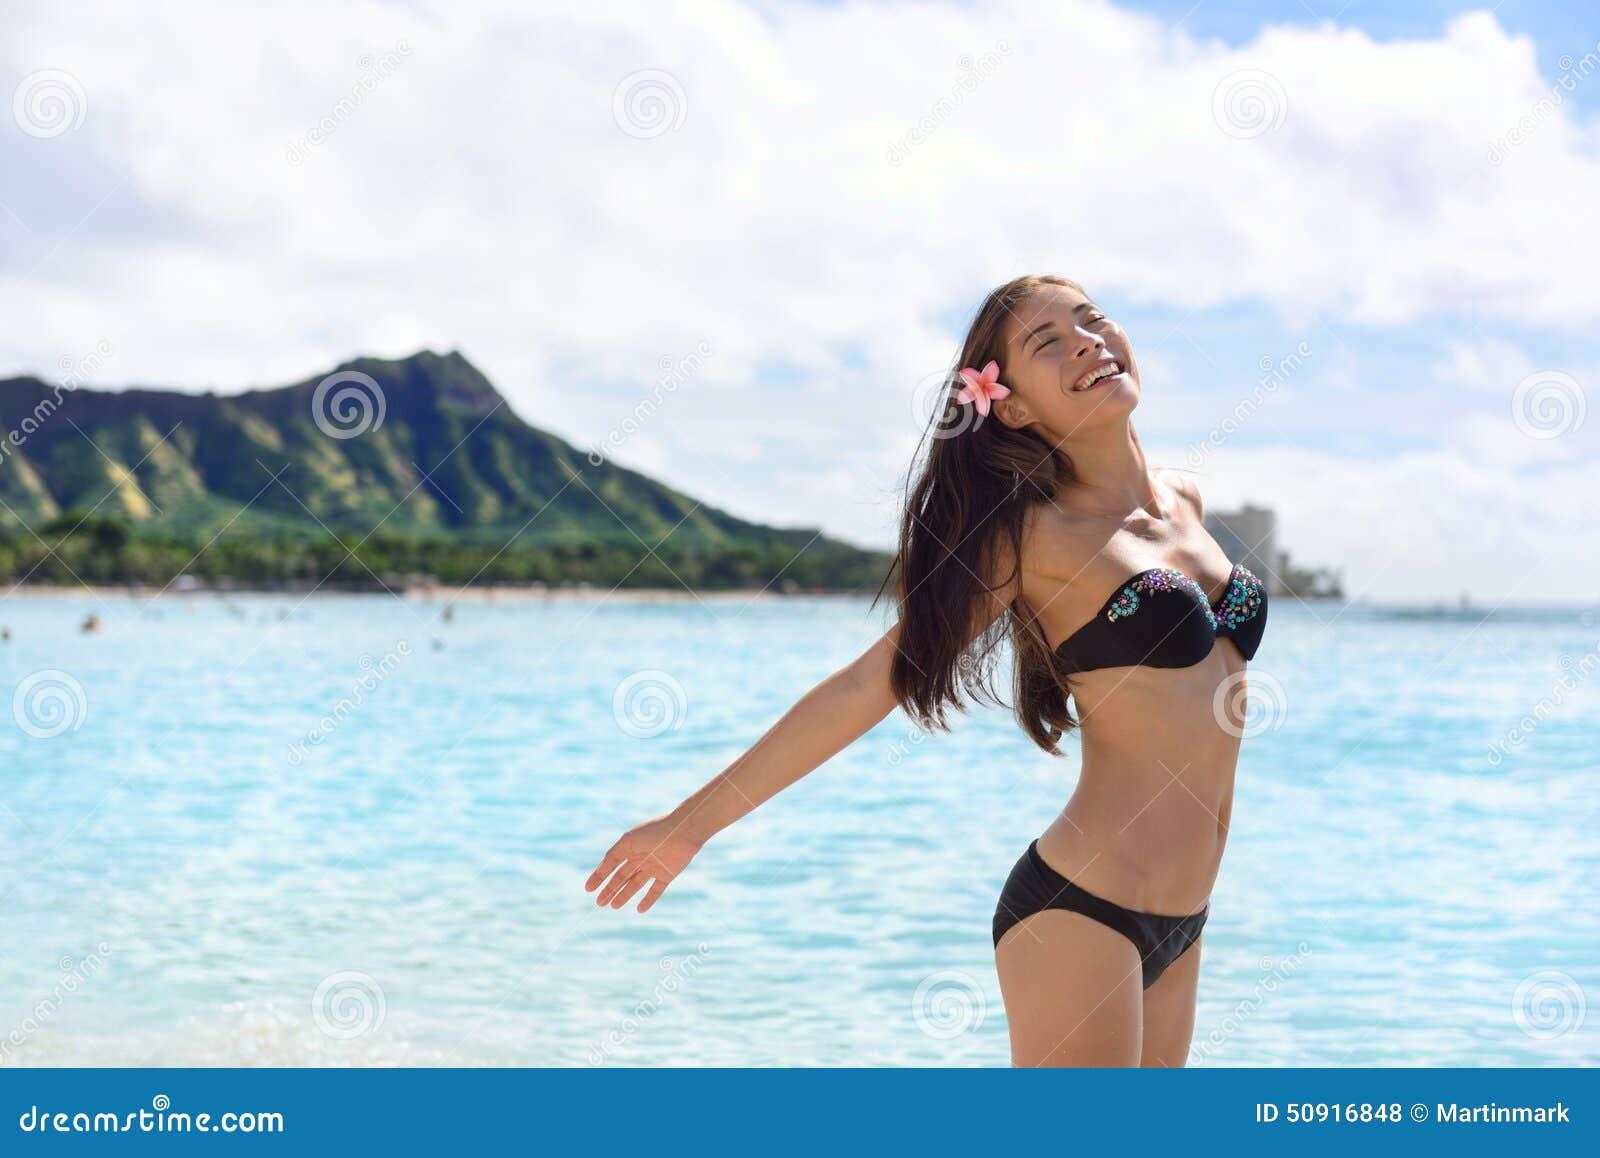 Free beach freedom beach nudism naturalist video 2